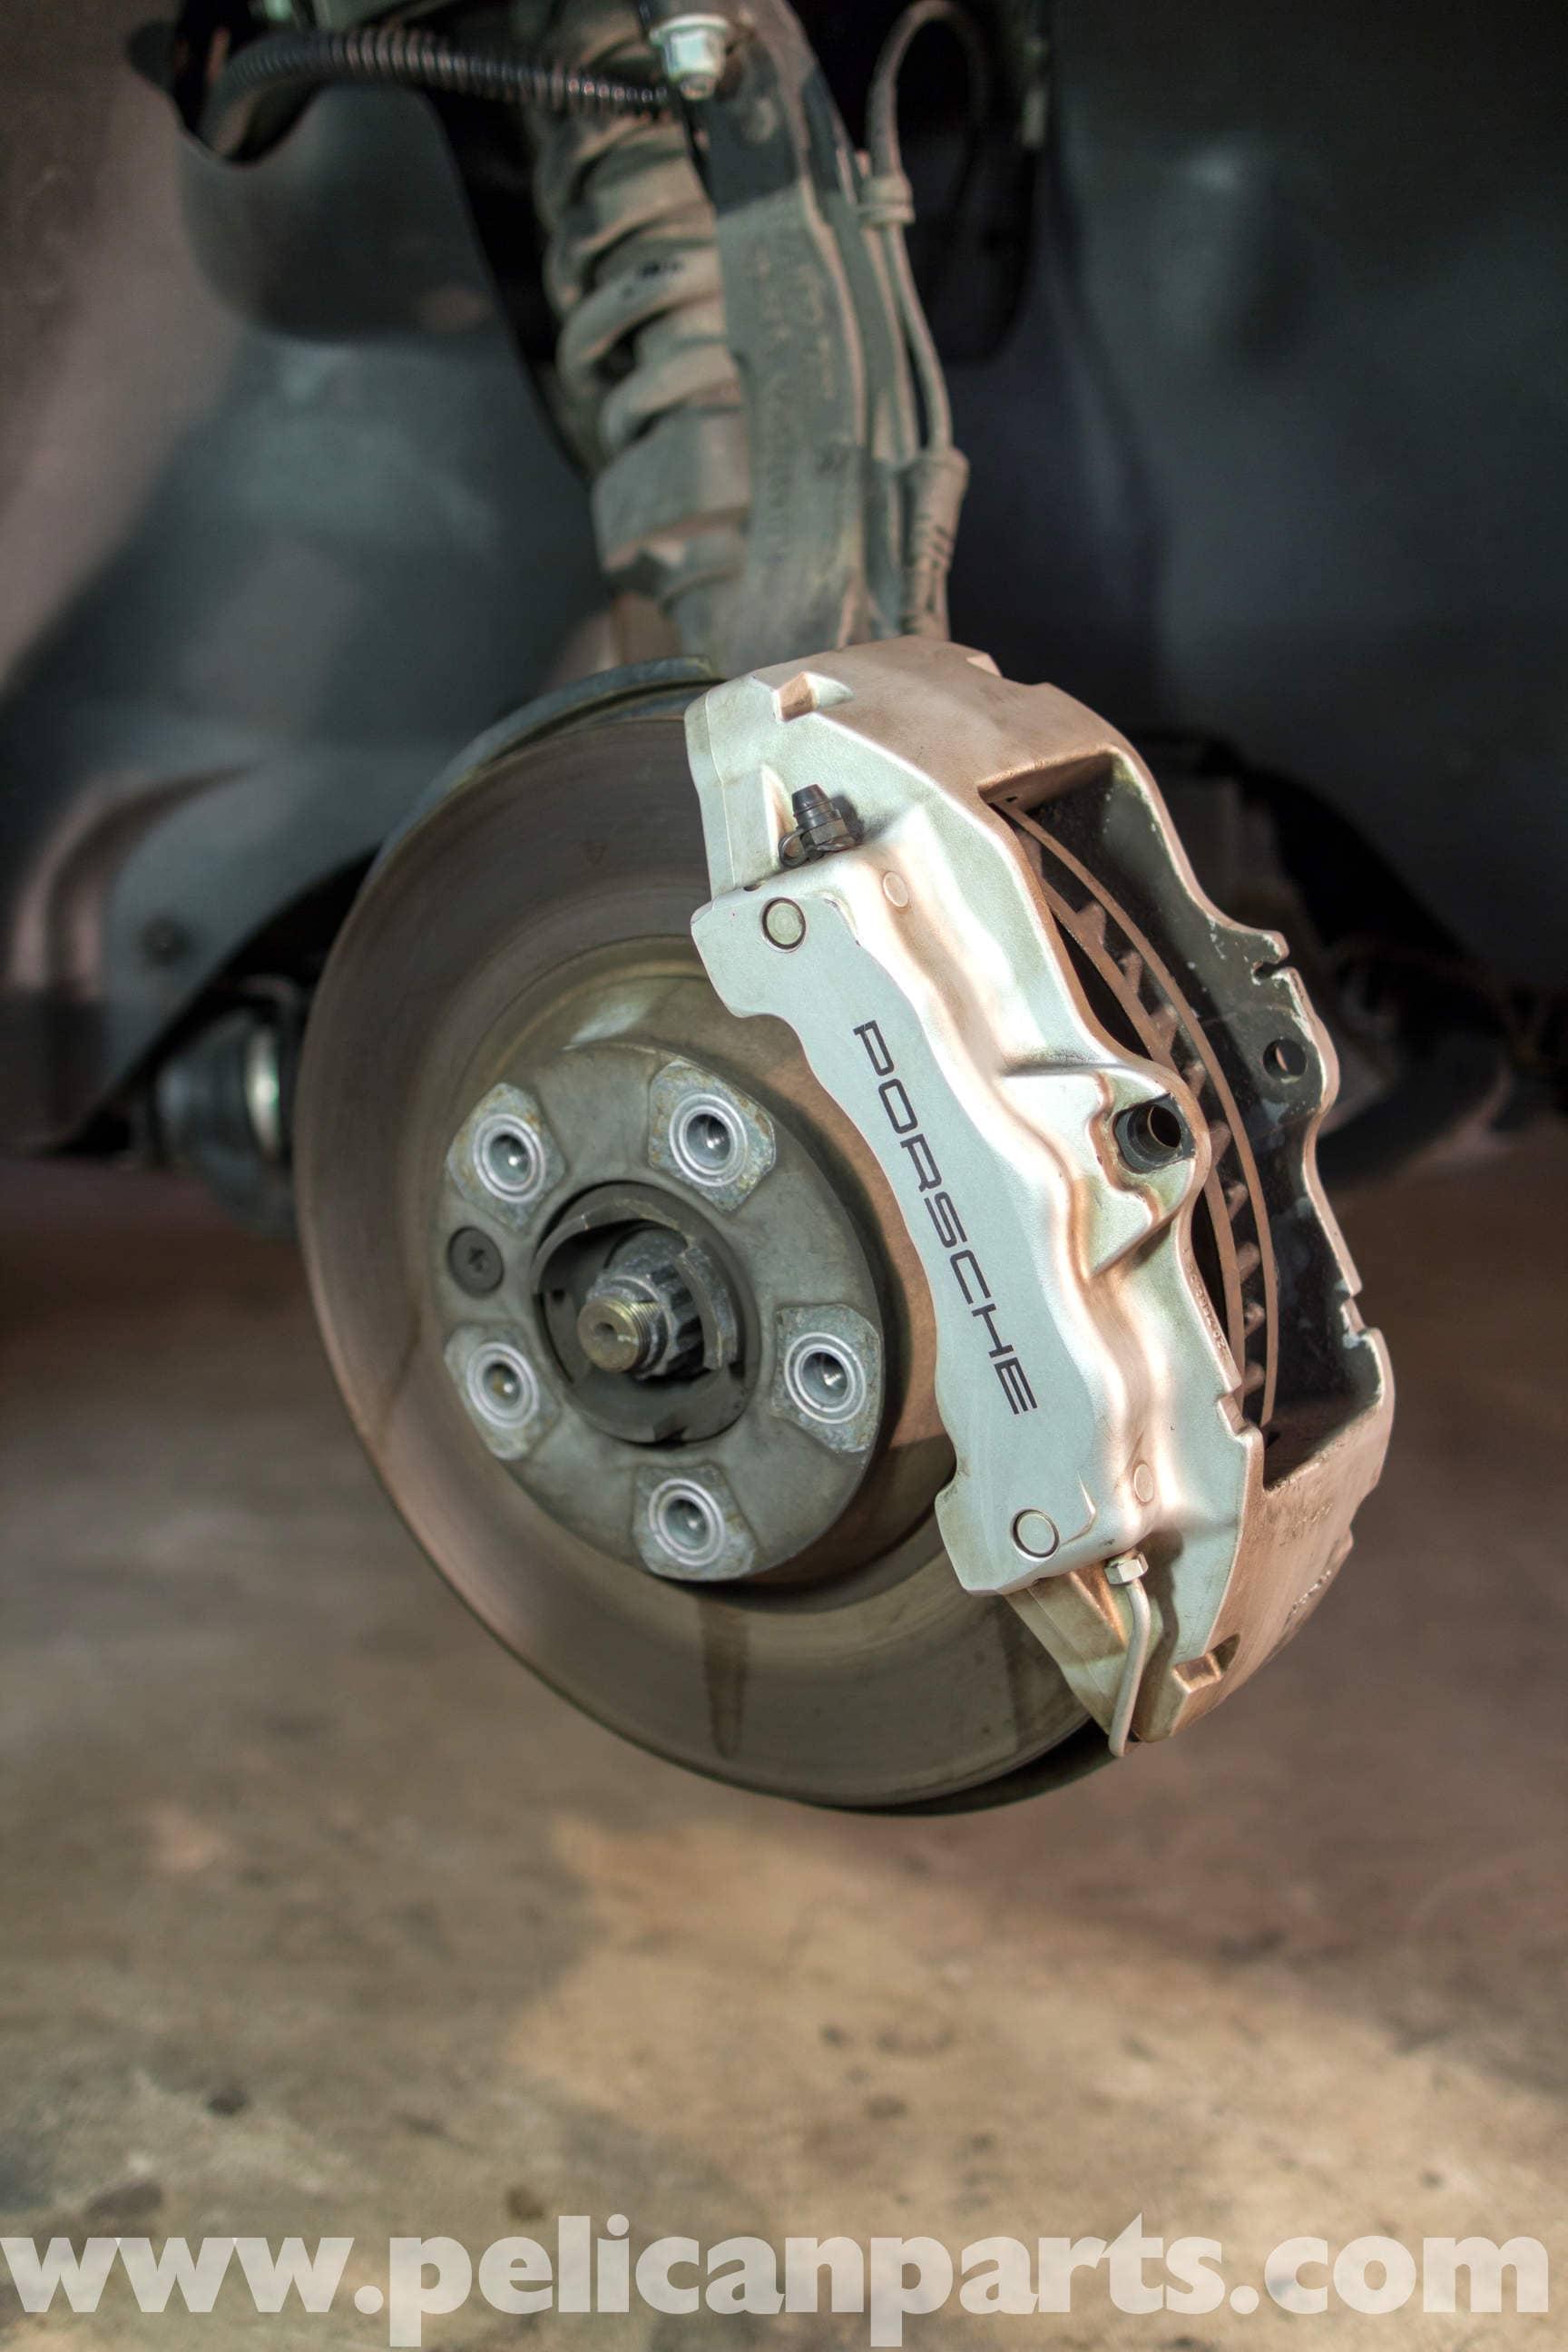 How Long Should Brake Pads Last >> Porsche Cayenne Front Brake Rotor Replacement   2003-2008   Pelican Parts DIY Maintenance Article